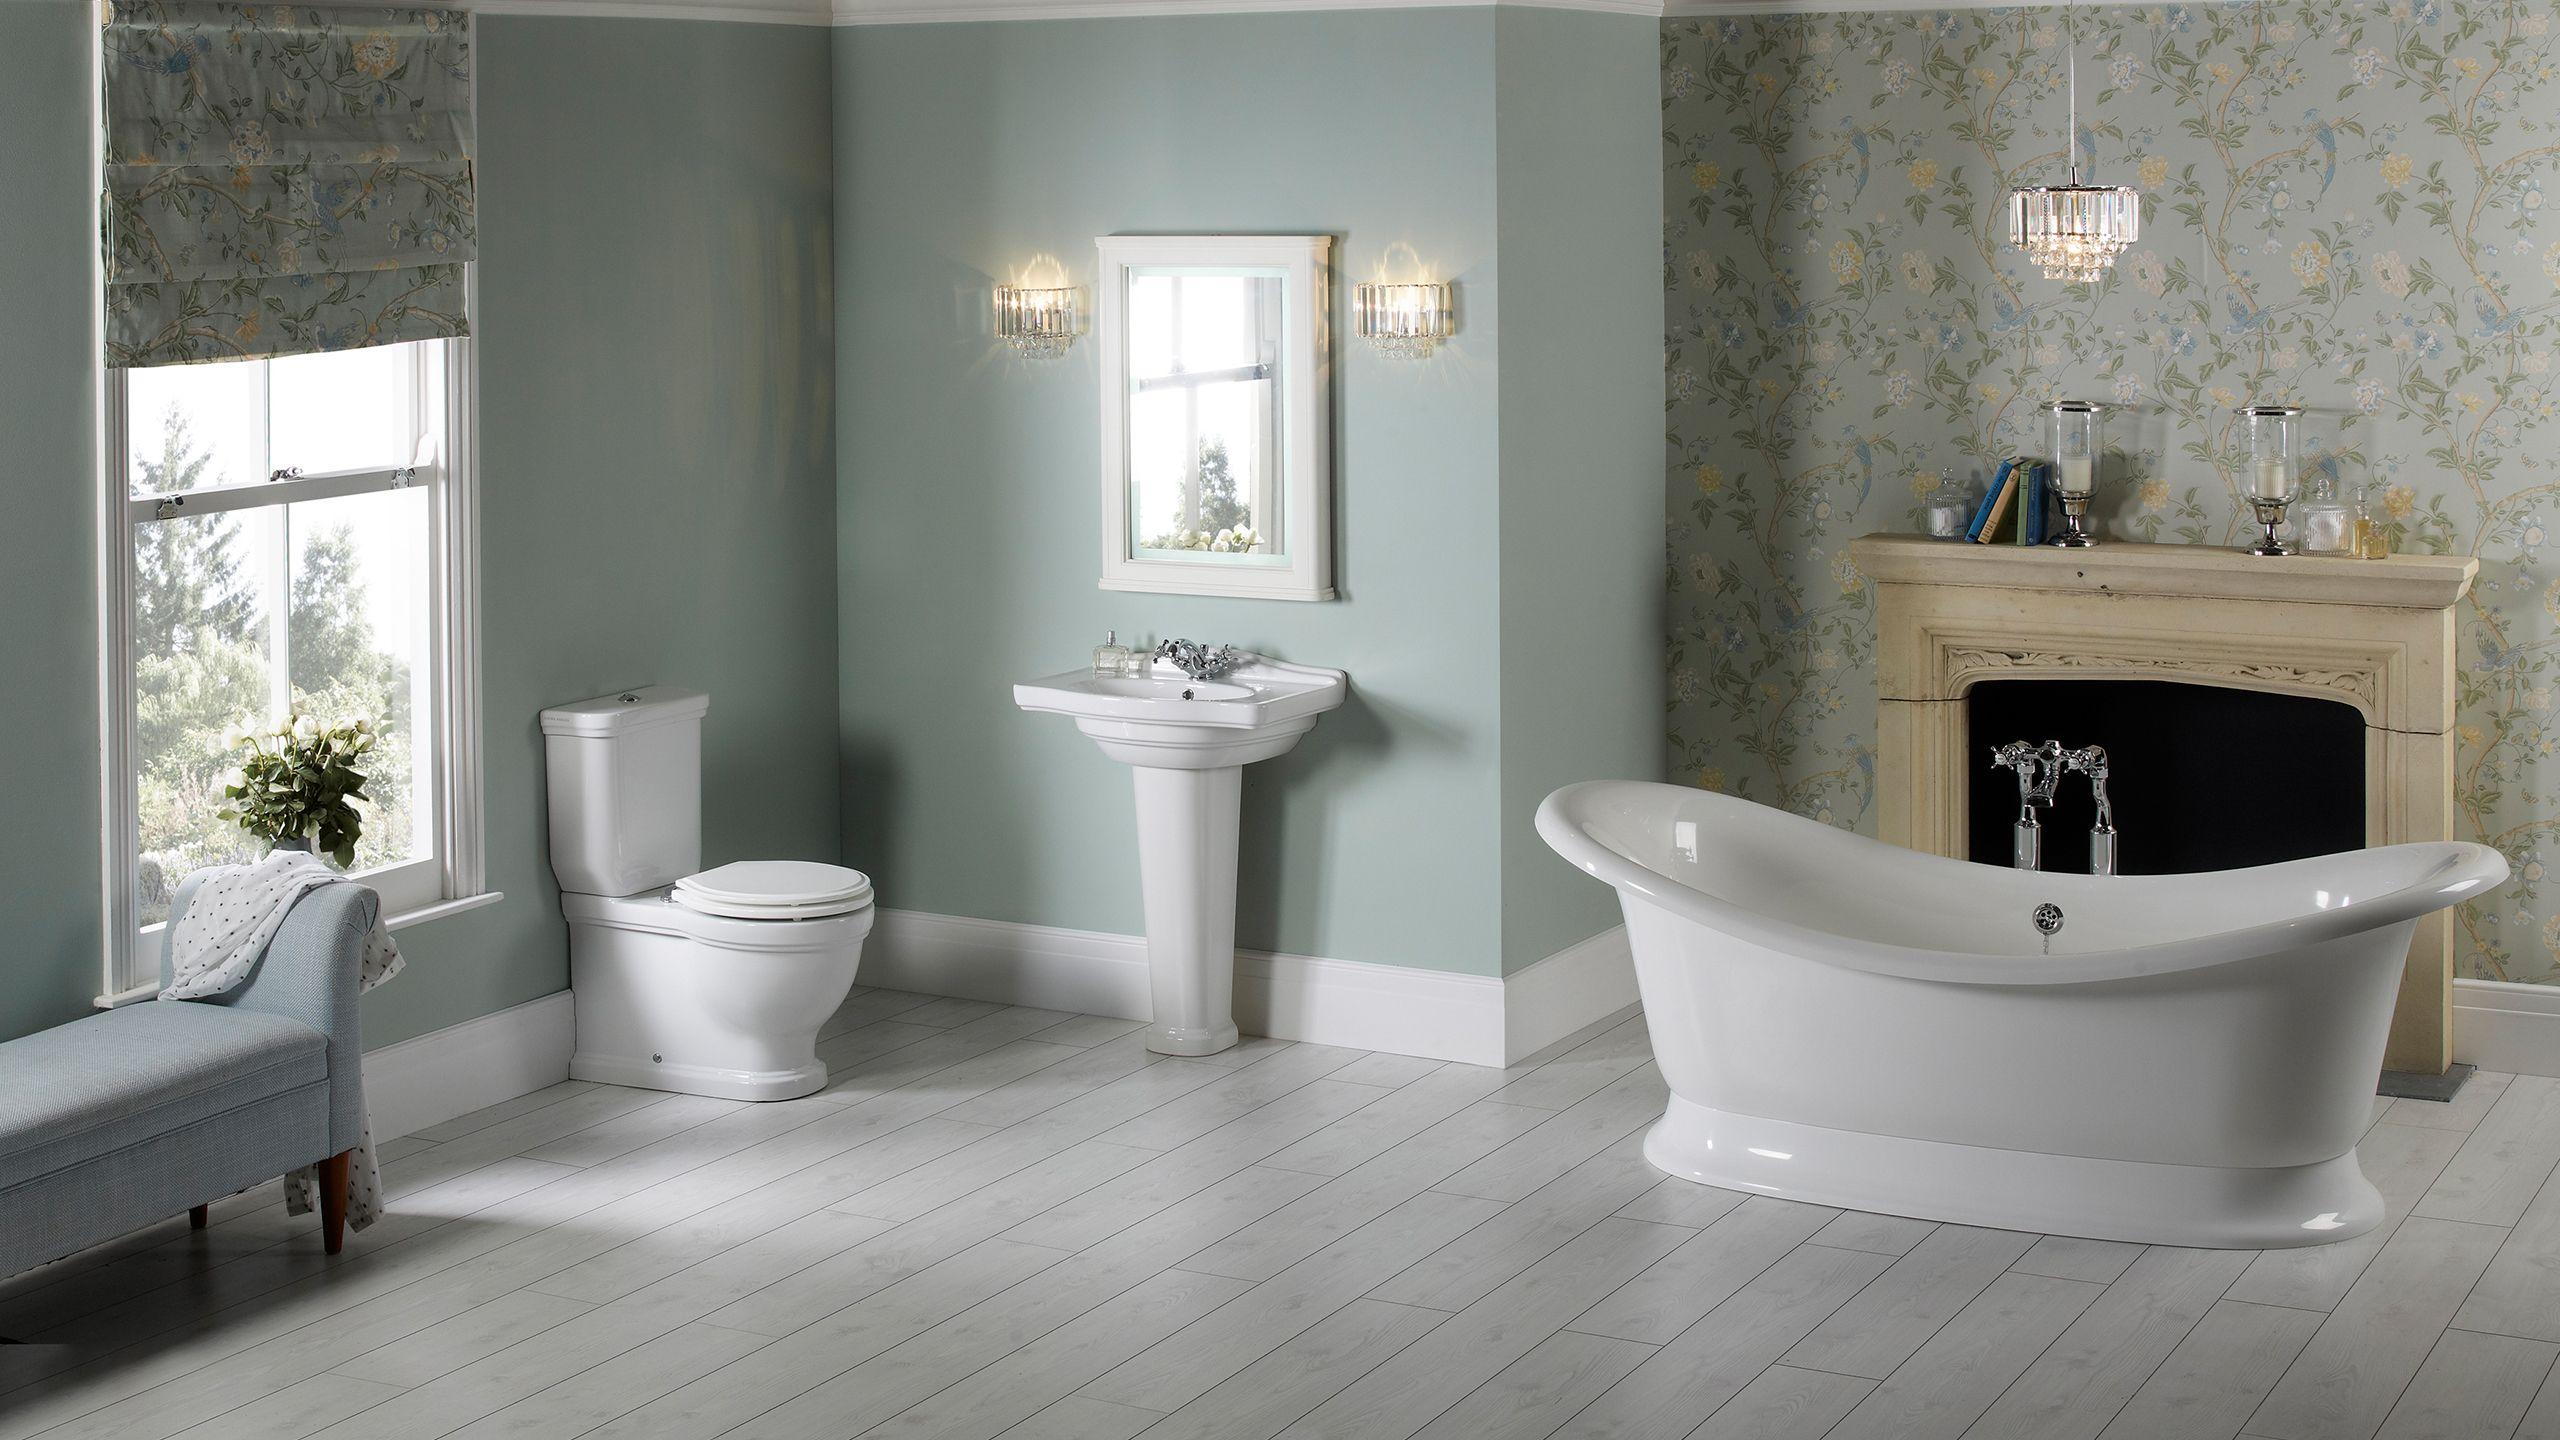 Bathroom Accessories Victoria marlborough tub| victoria + albert tubs us | freestanding tubs